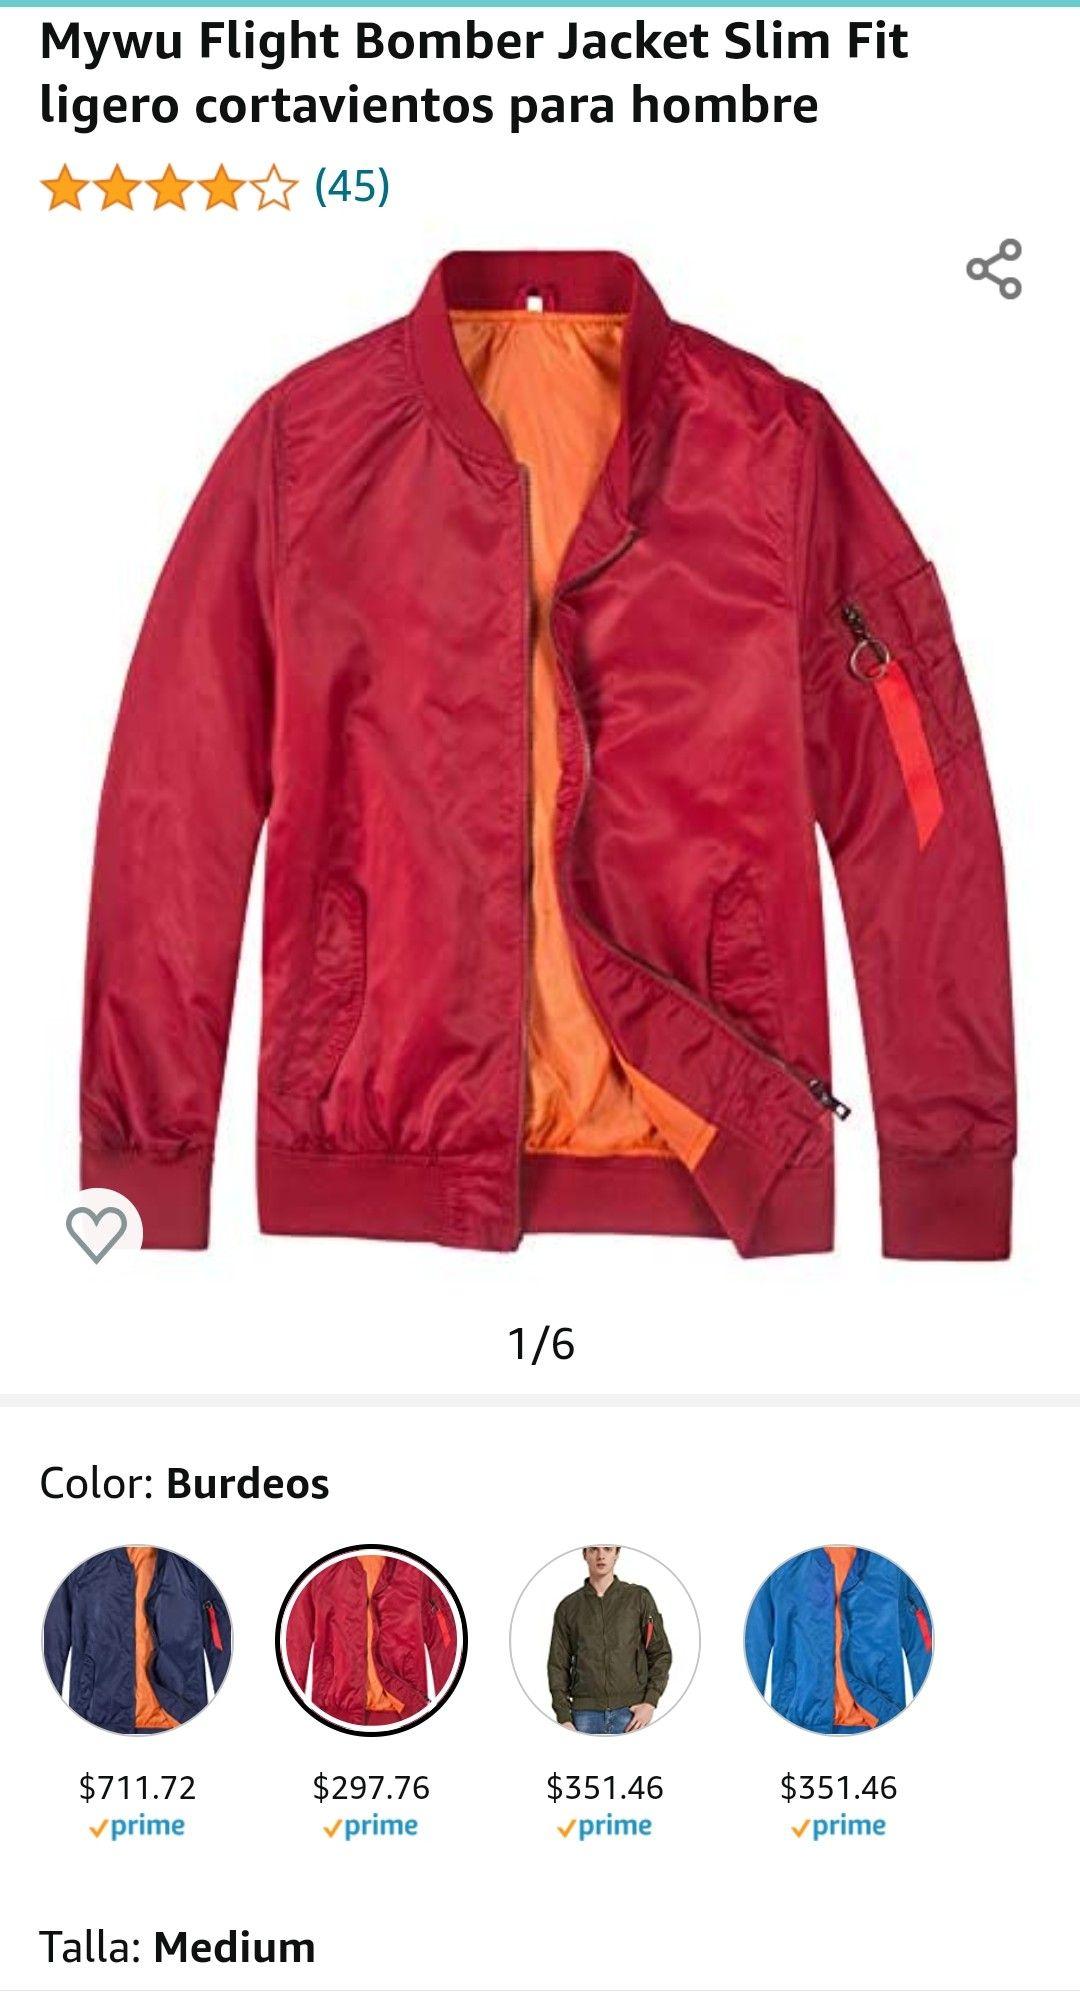 Amazon: Chamarra Bomber Slim Fit ligero cortavientos para hombre